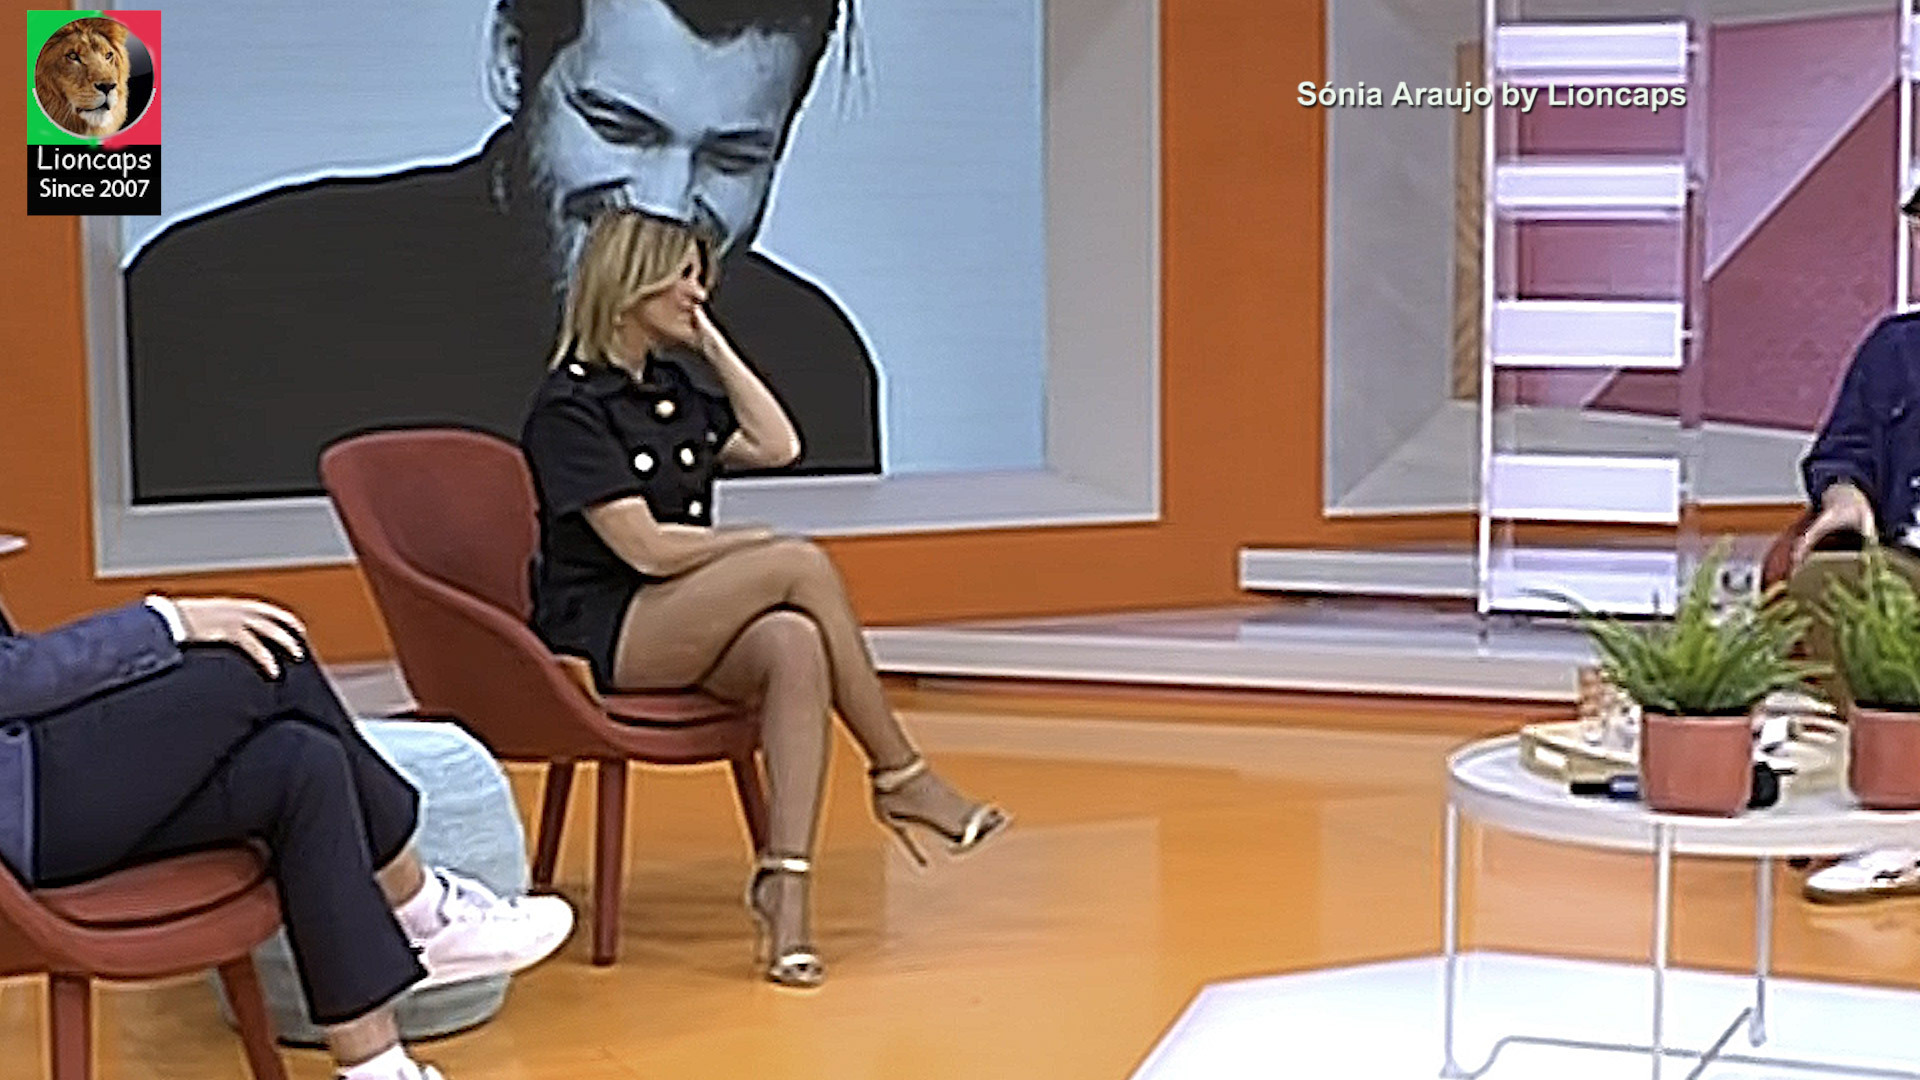 sonia_araujo_praca_lioncaps_11_04_2021 (5).jpg